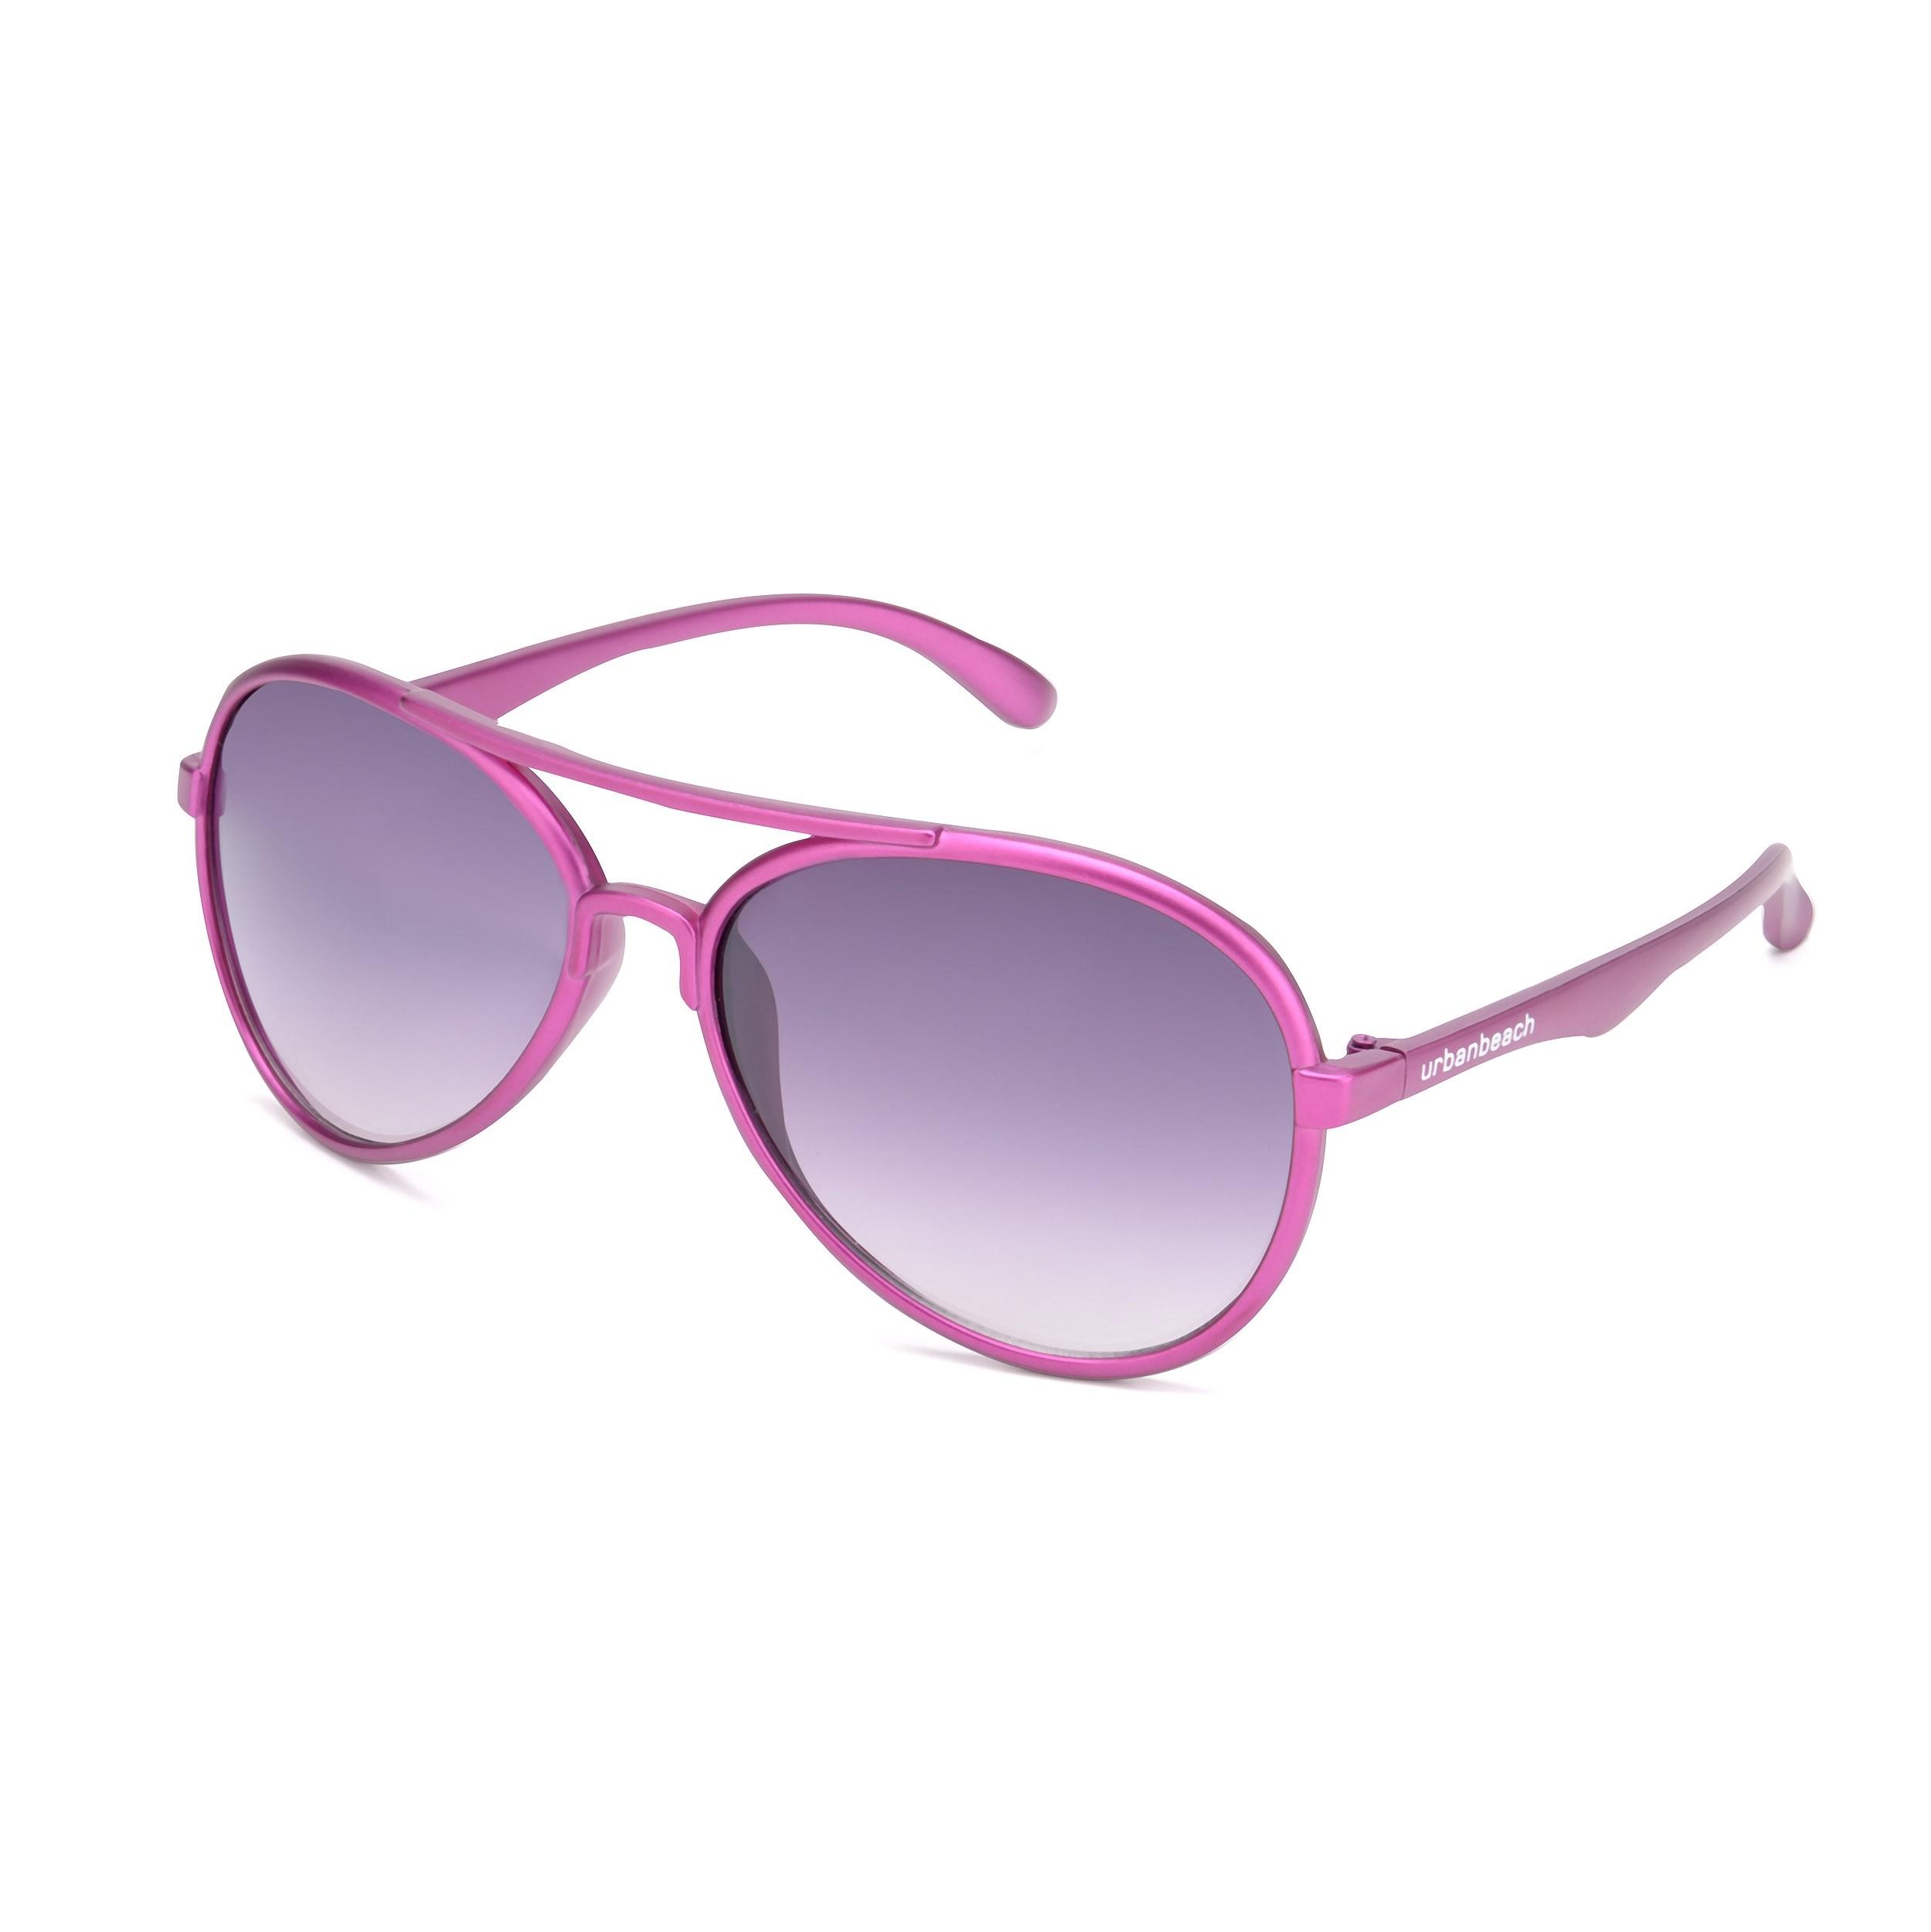 Unisex Dalfon Pink Sunglasses